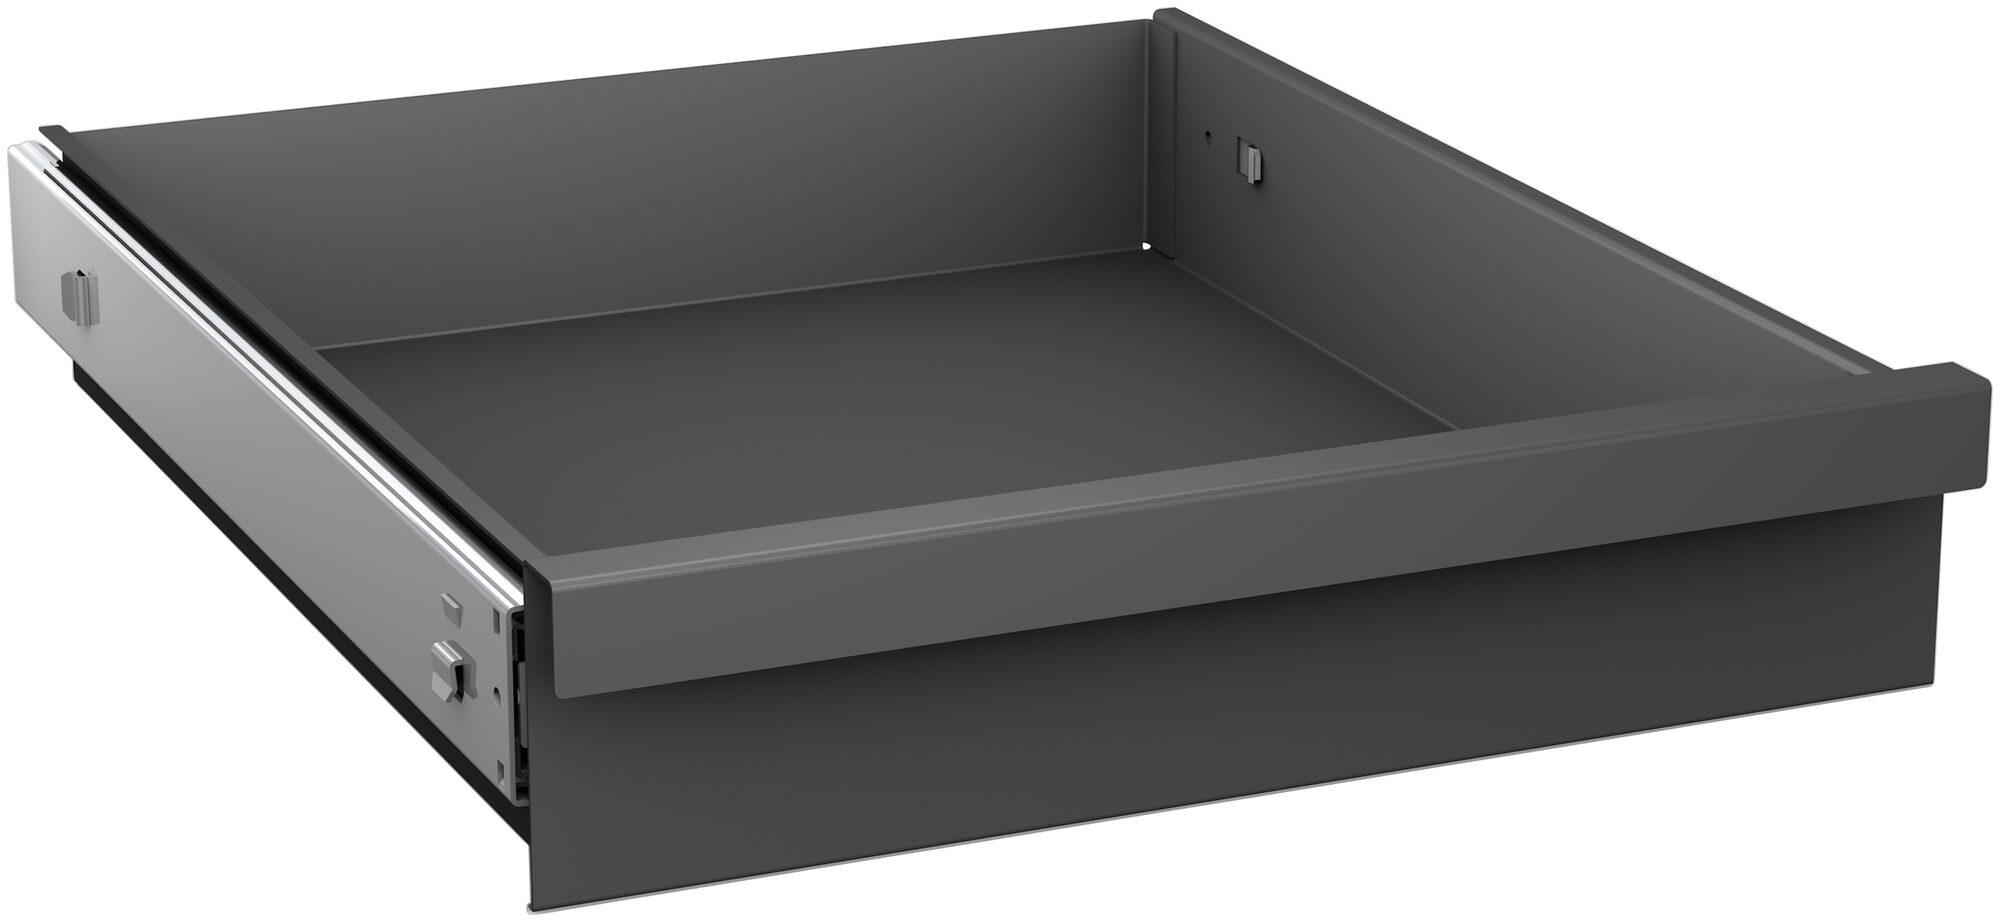 HAZET Regal-Schublade 179NW-22